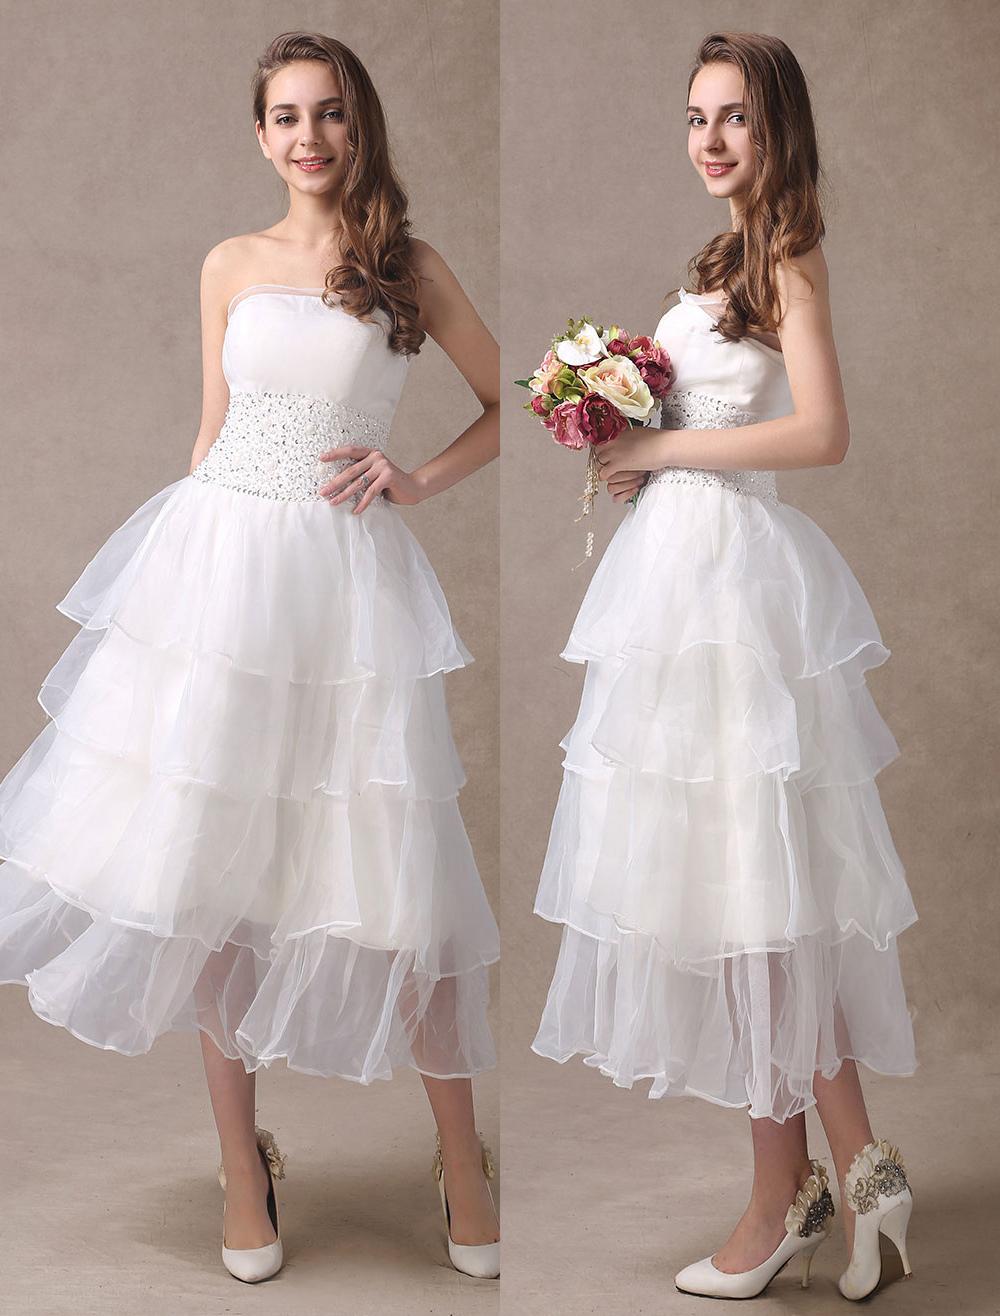 Tiered Tea Length Dresses